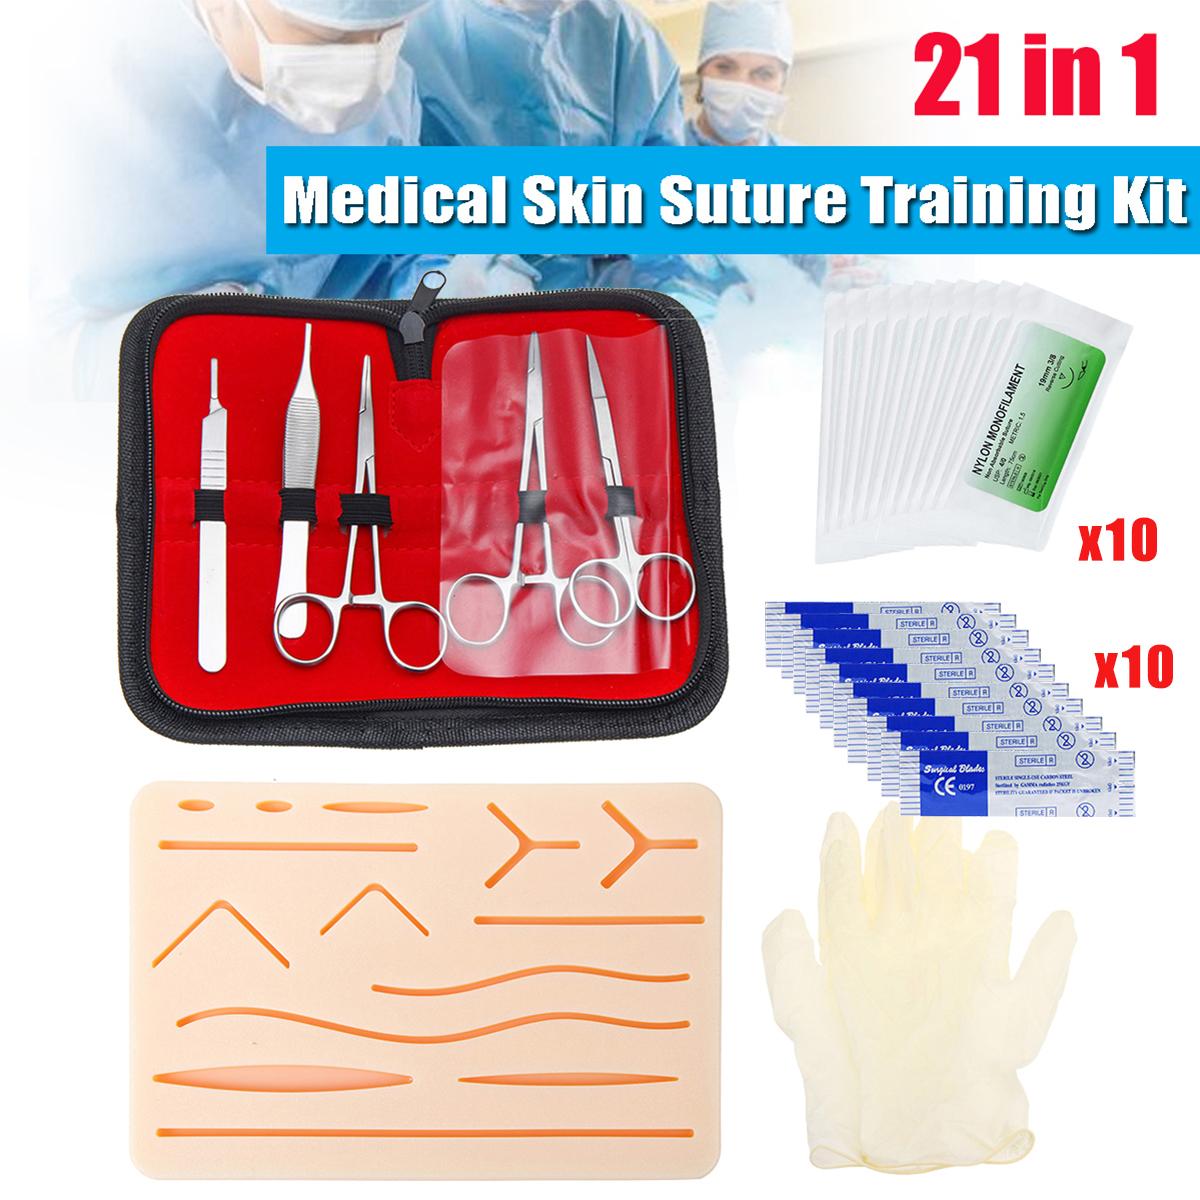 25pcs Surgical Suture Training Kit Skin Operate Suture Practice Model Training Pad Needle Scissors Tool Kit Medical Teaching